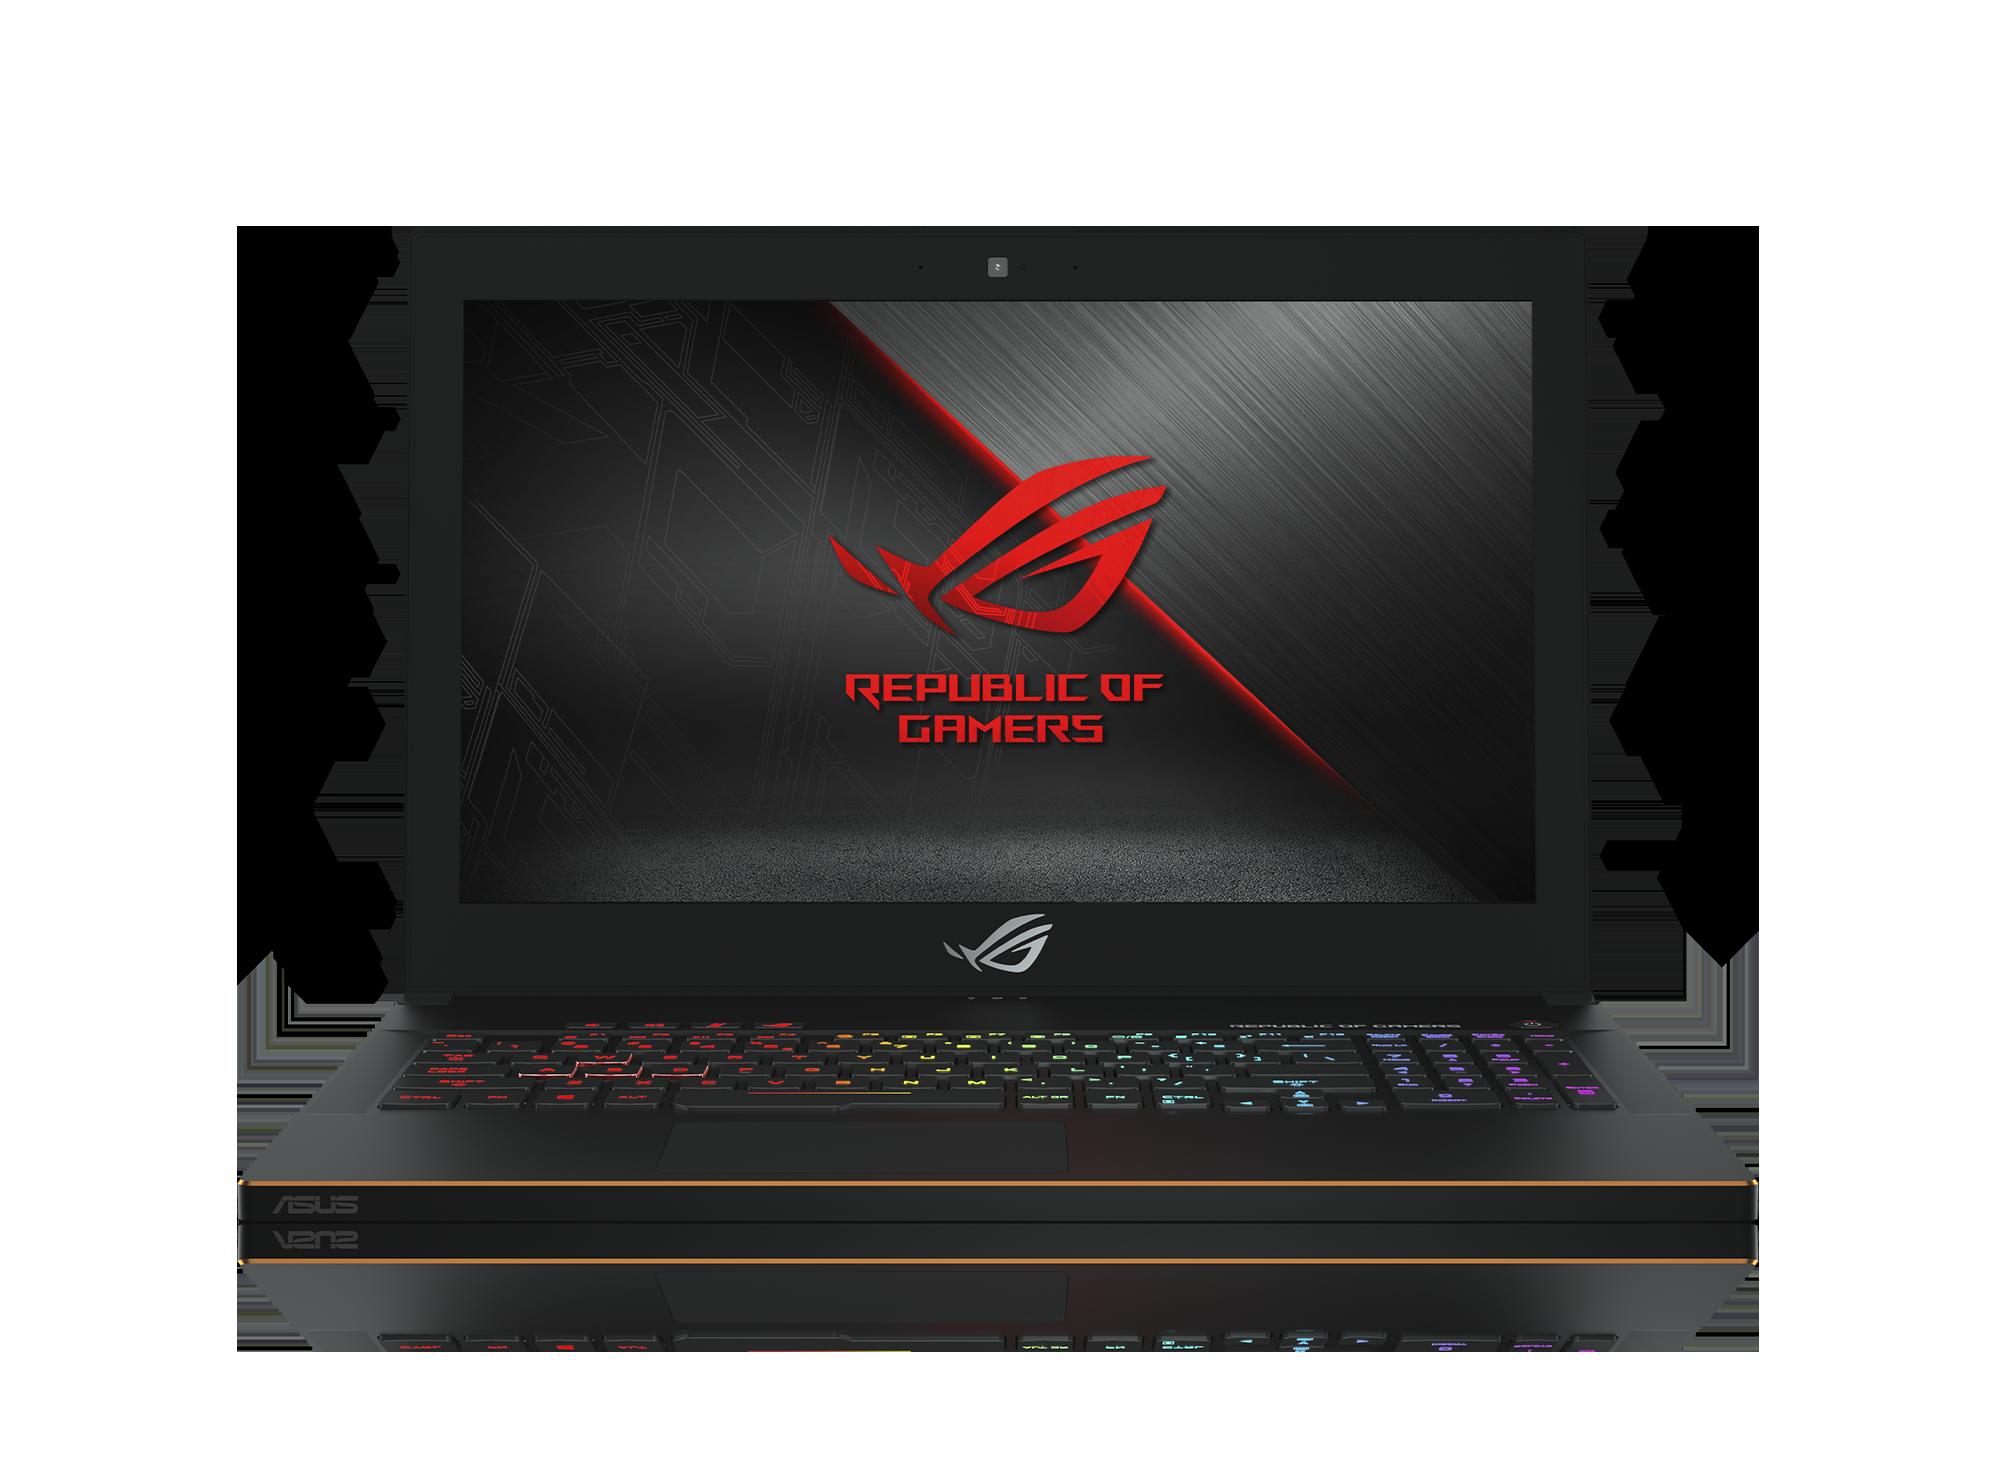 ROG Zephyrus M GM501   ROG Zephyrus M GM501   Gaming Laptops ROG - Republic  of Gamers ROG Global